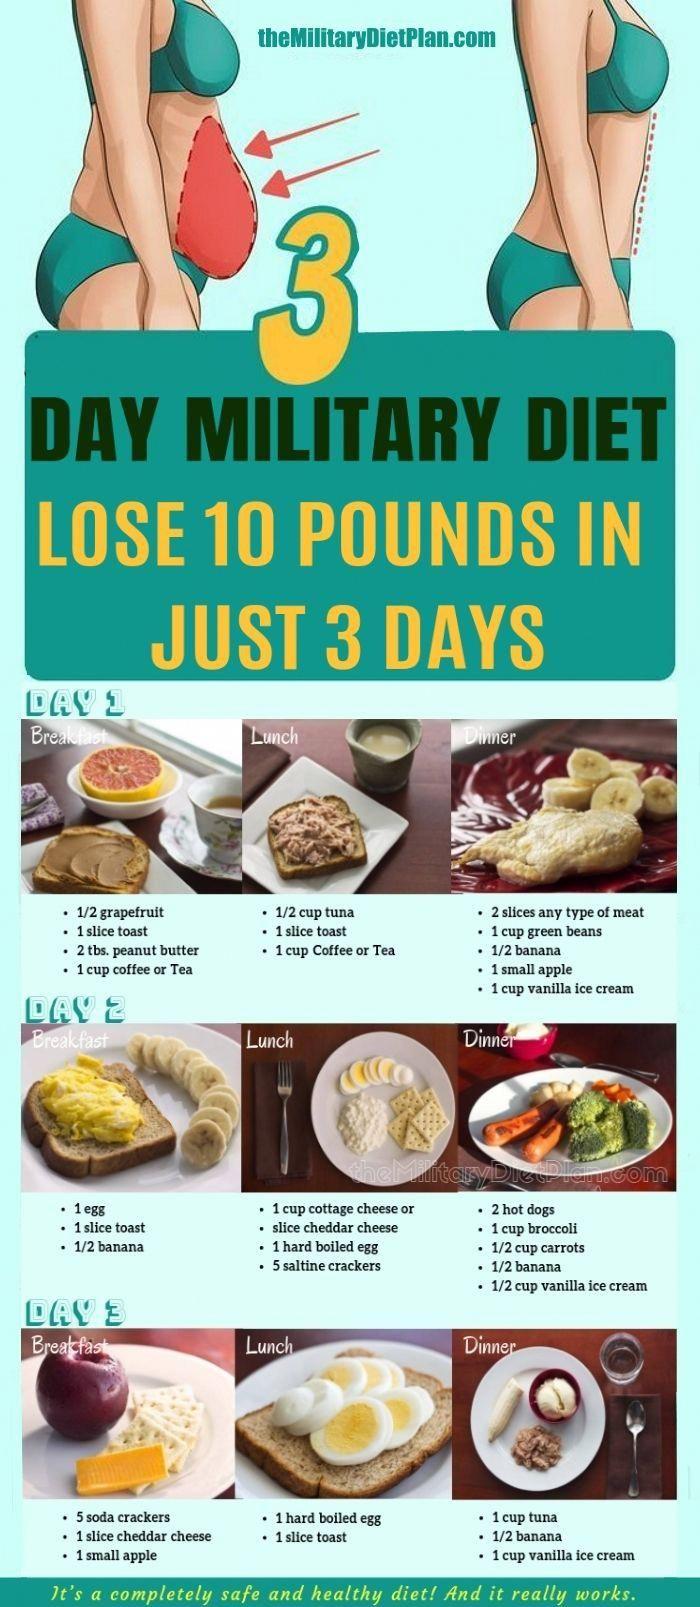 cleanse bun pentru a pierde in greutate vrac up pierde burta gras